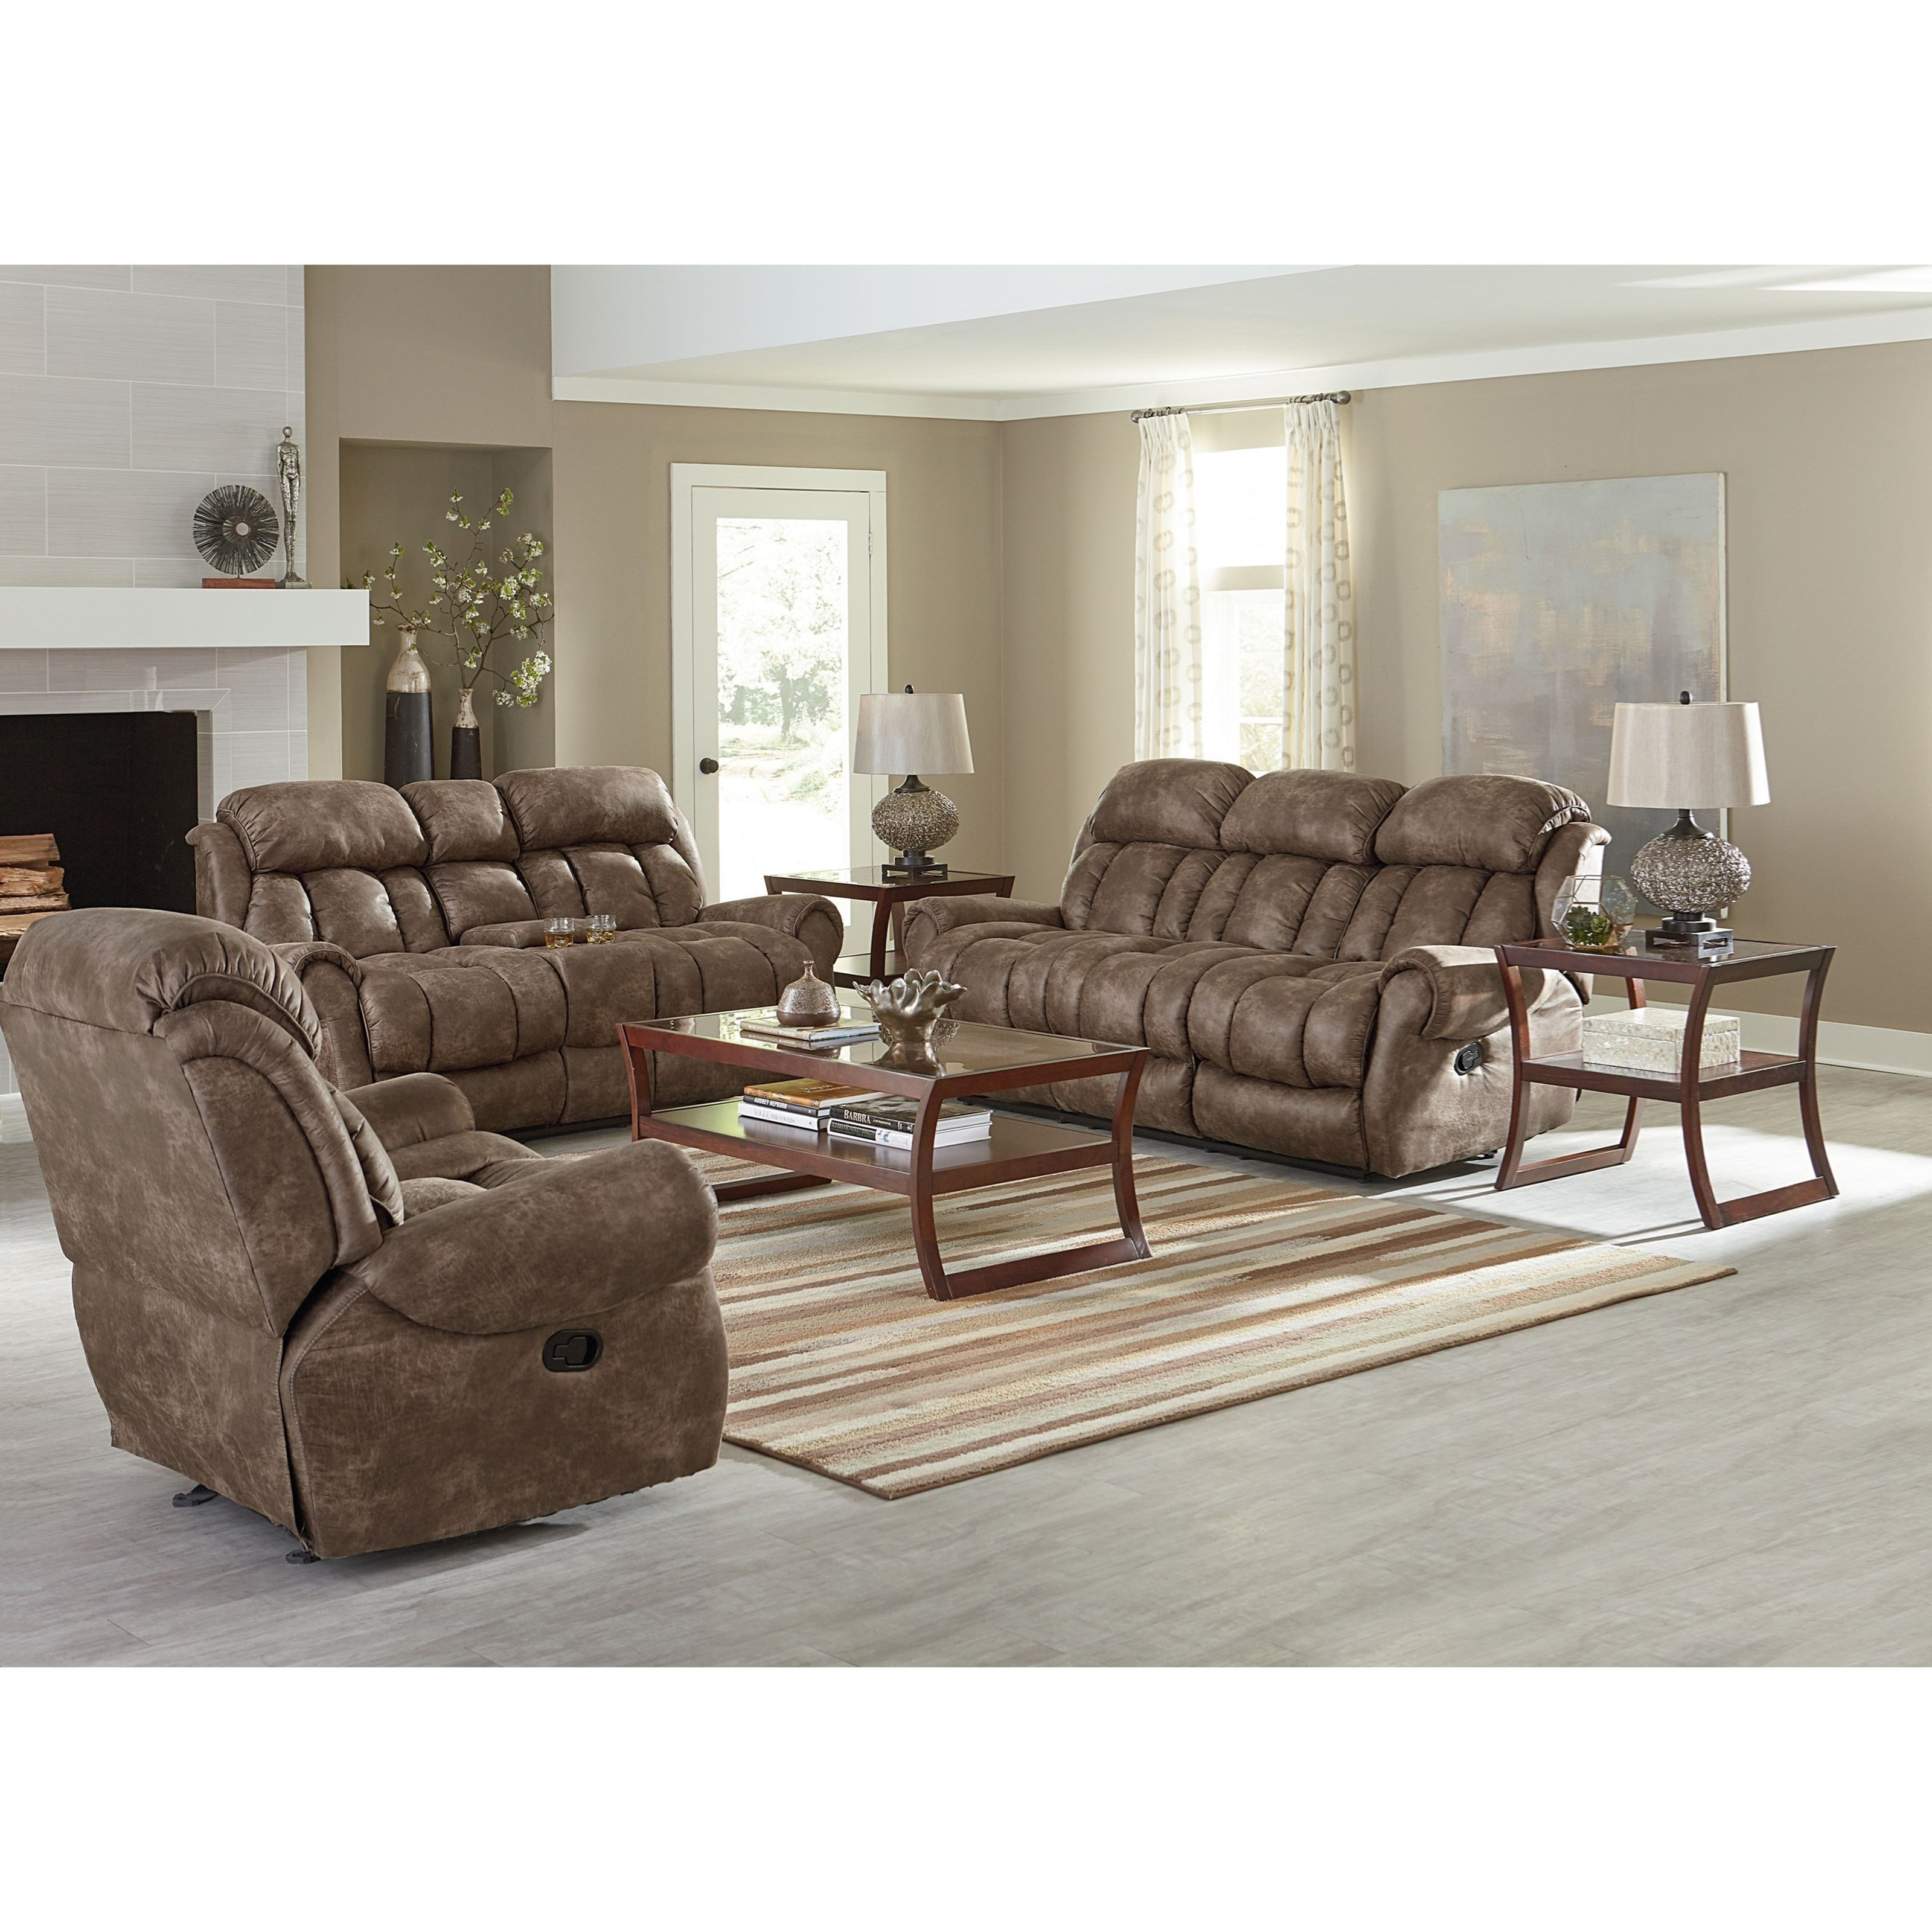 Standard Furniture Summit Reclining Living Room Group